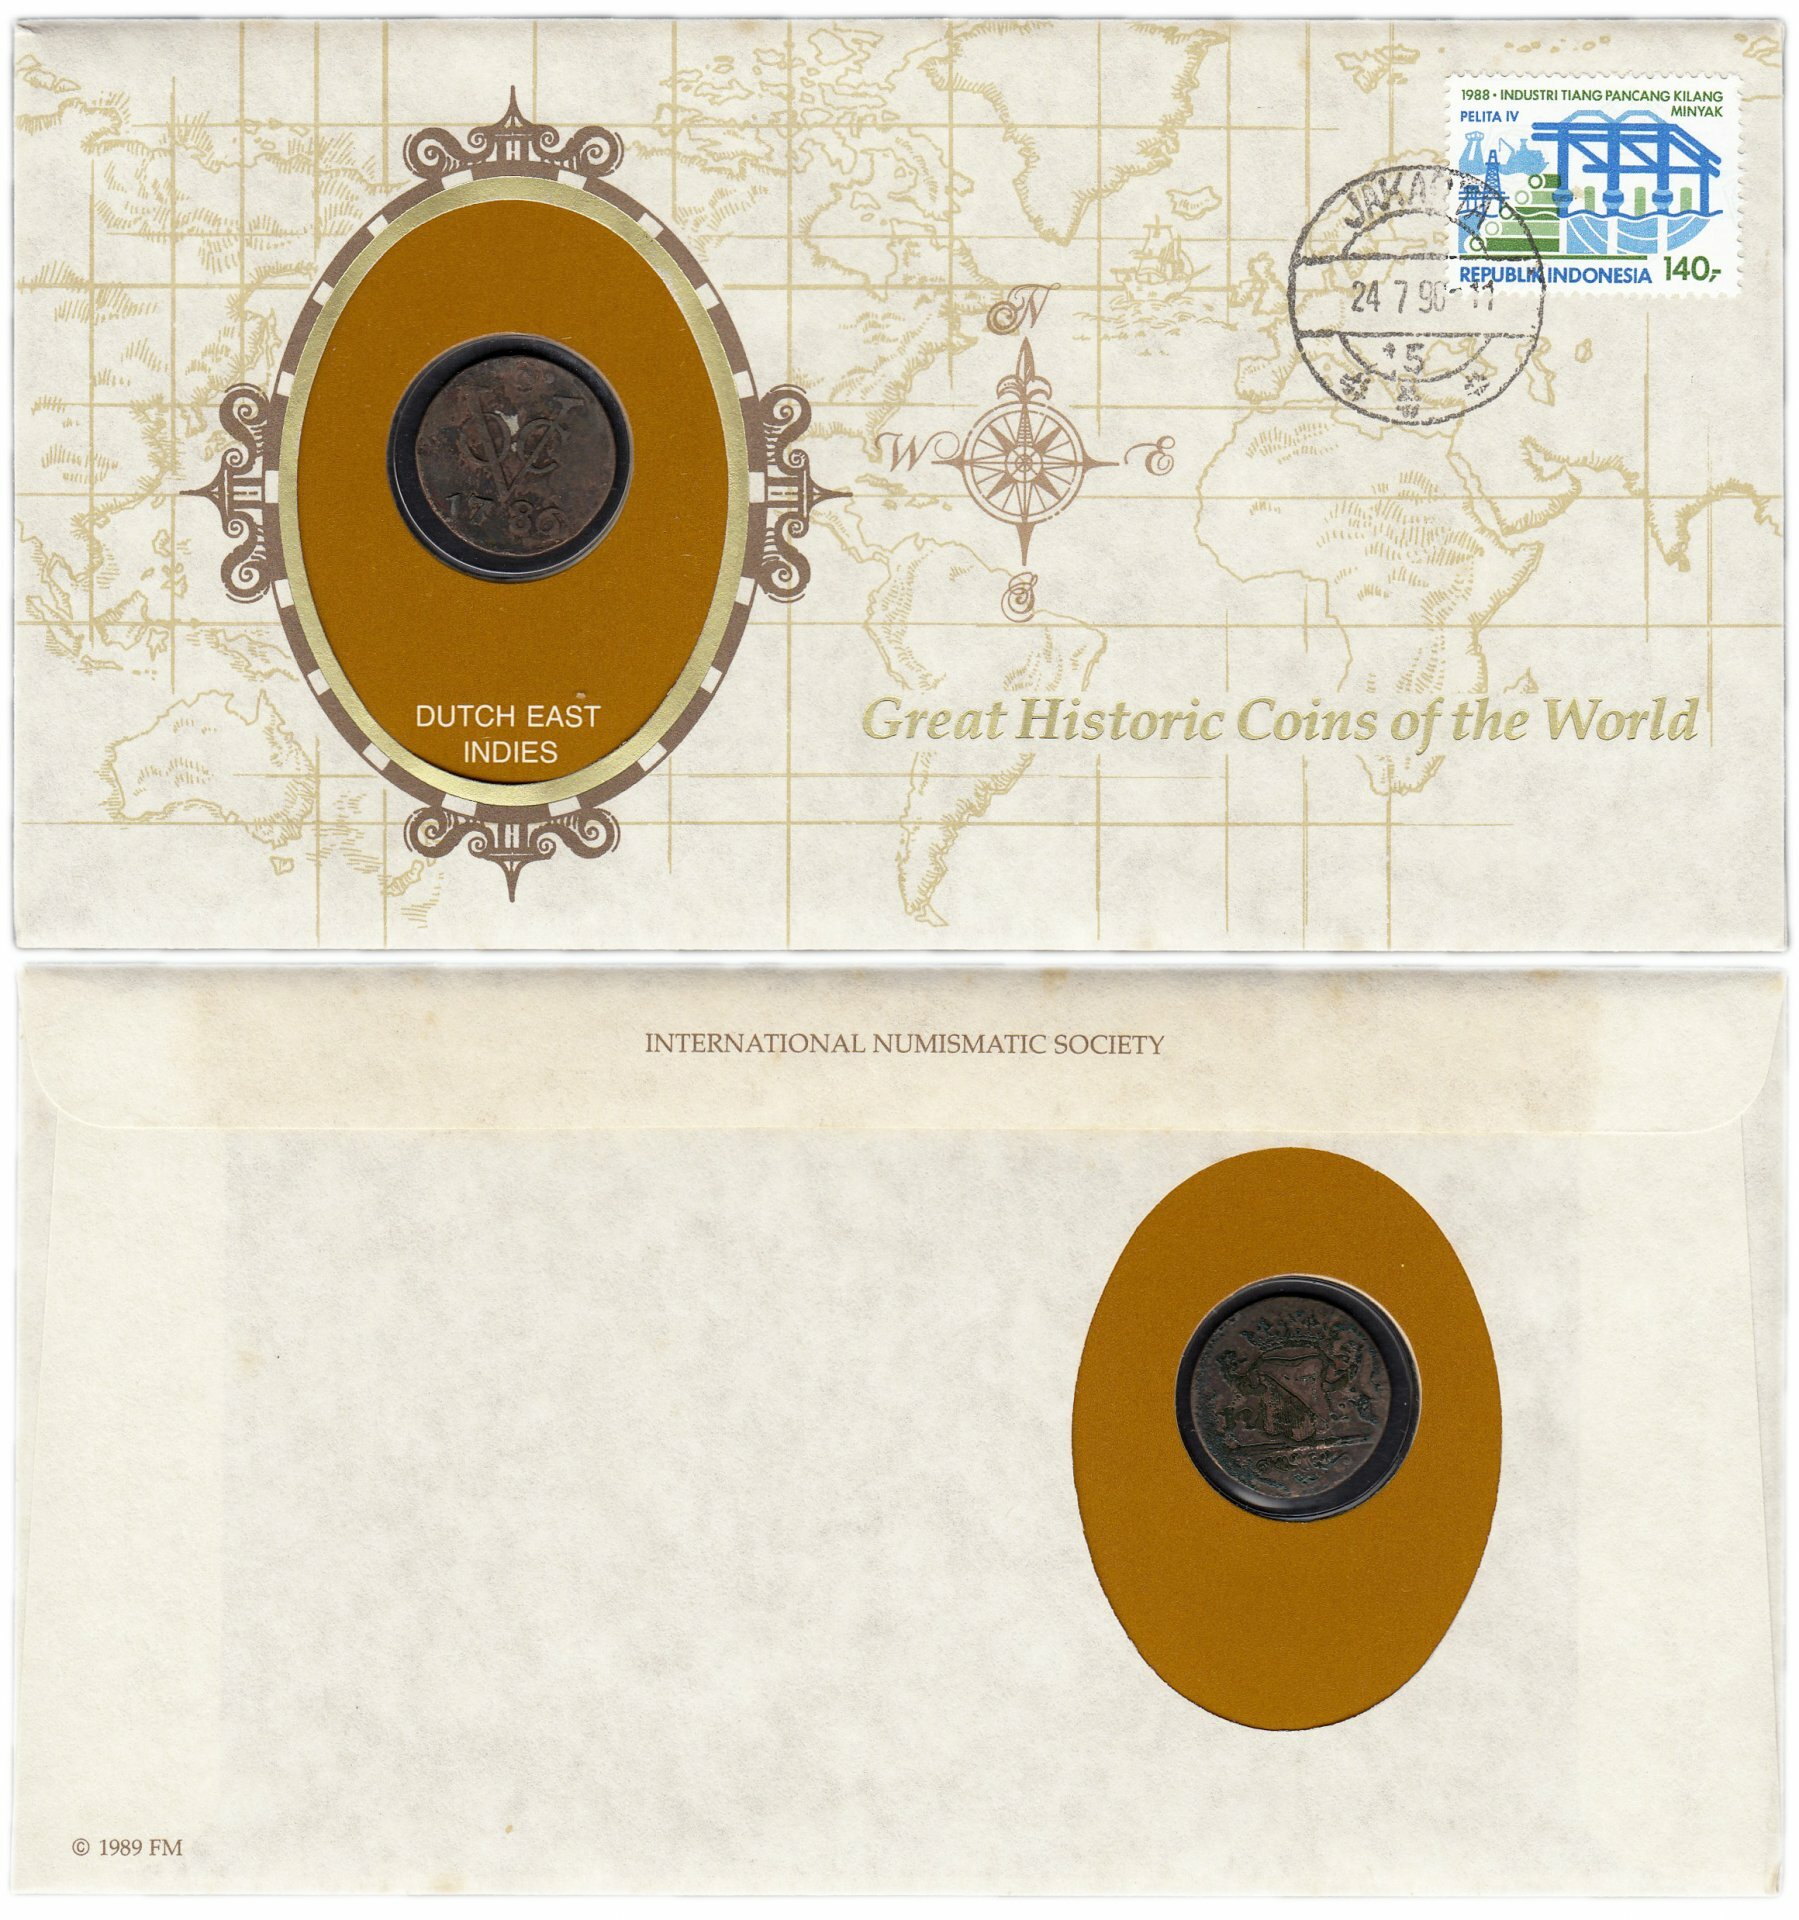 Серия «Великие исторические монеты мира» - Голландская Ост - Индия 1 дуит 1786 (монета и 1 марка в конверте) T003101